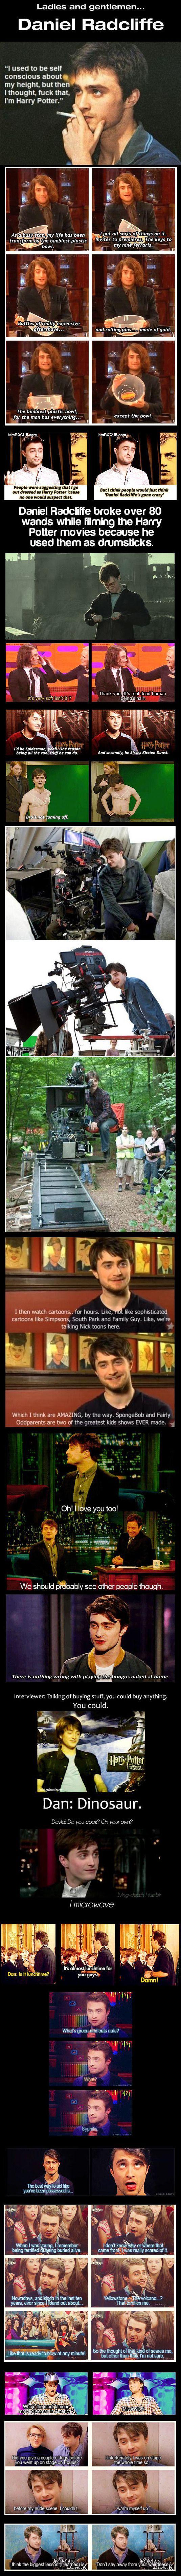 Ladies and Gentlemen...Daniel Radcliffe more funny pics on facebook: https://www.facebook.com/yourfunnypics101